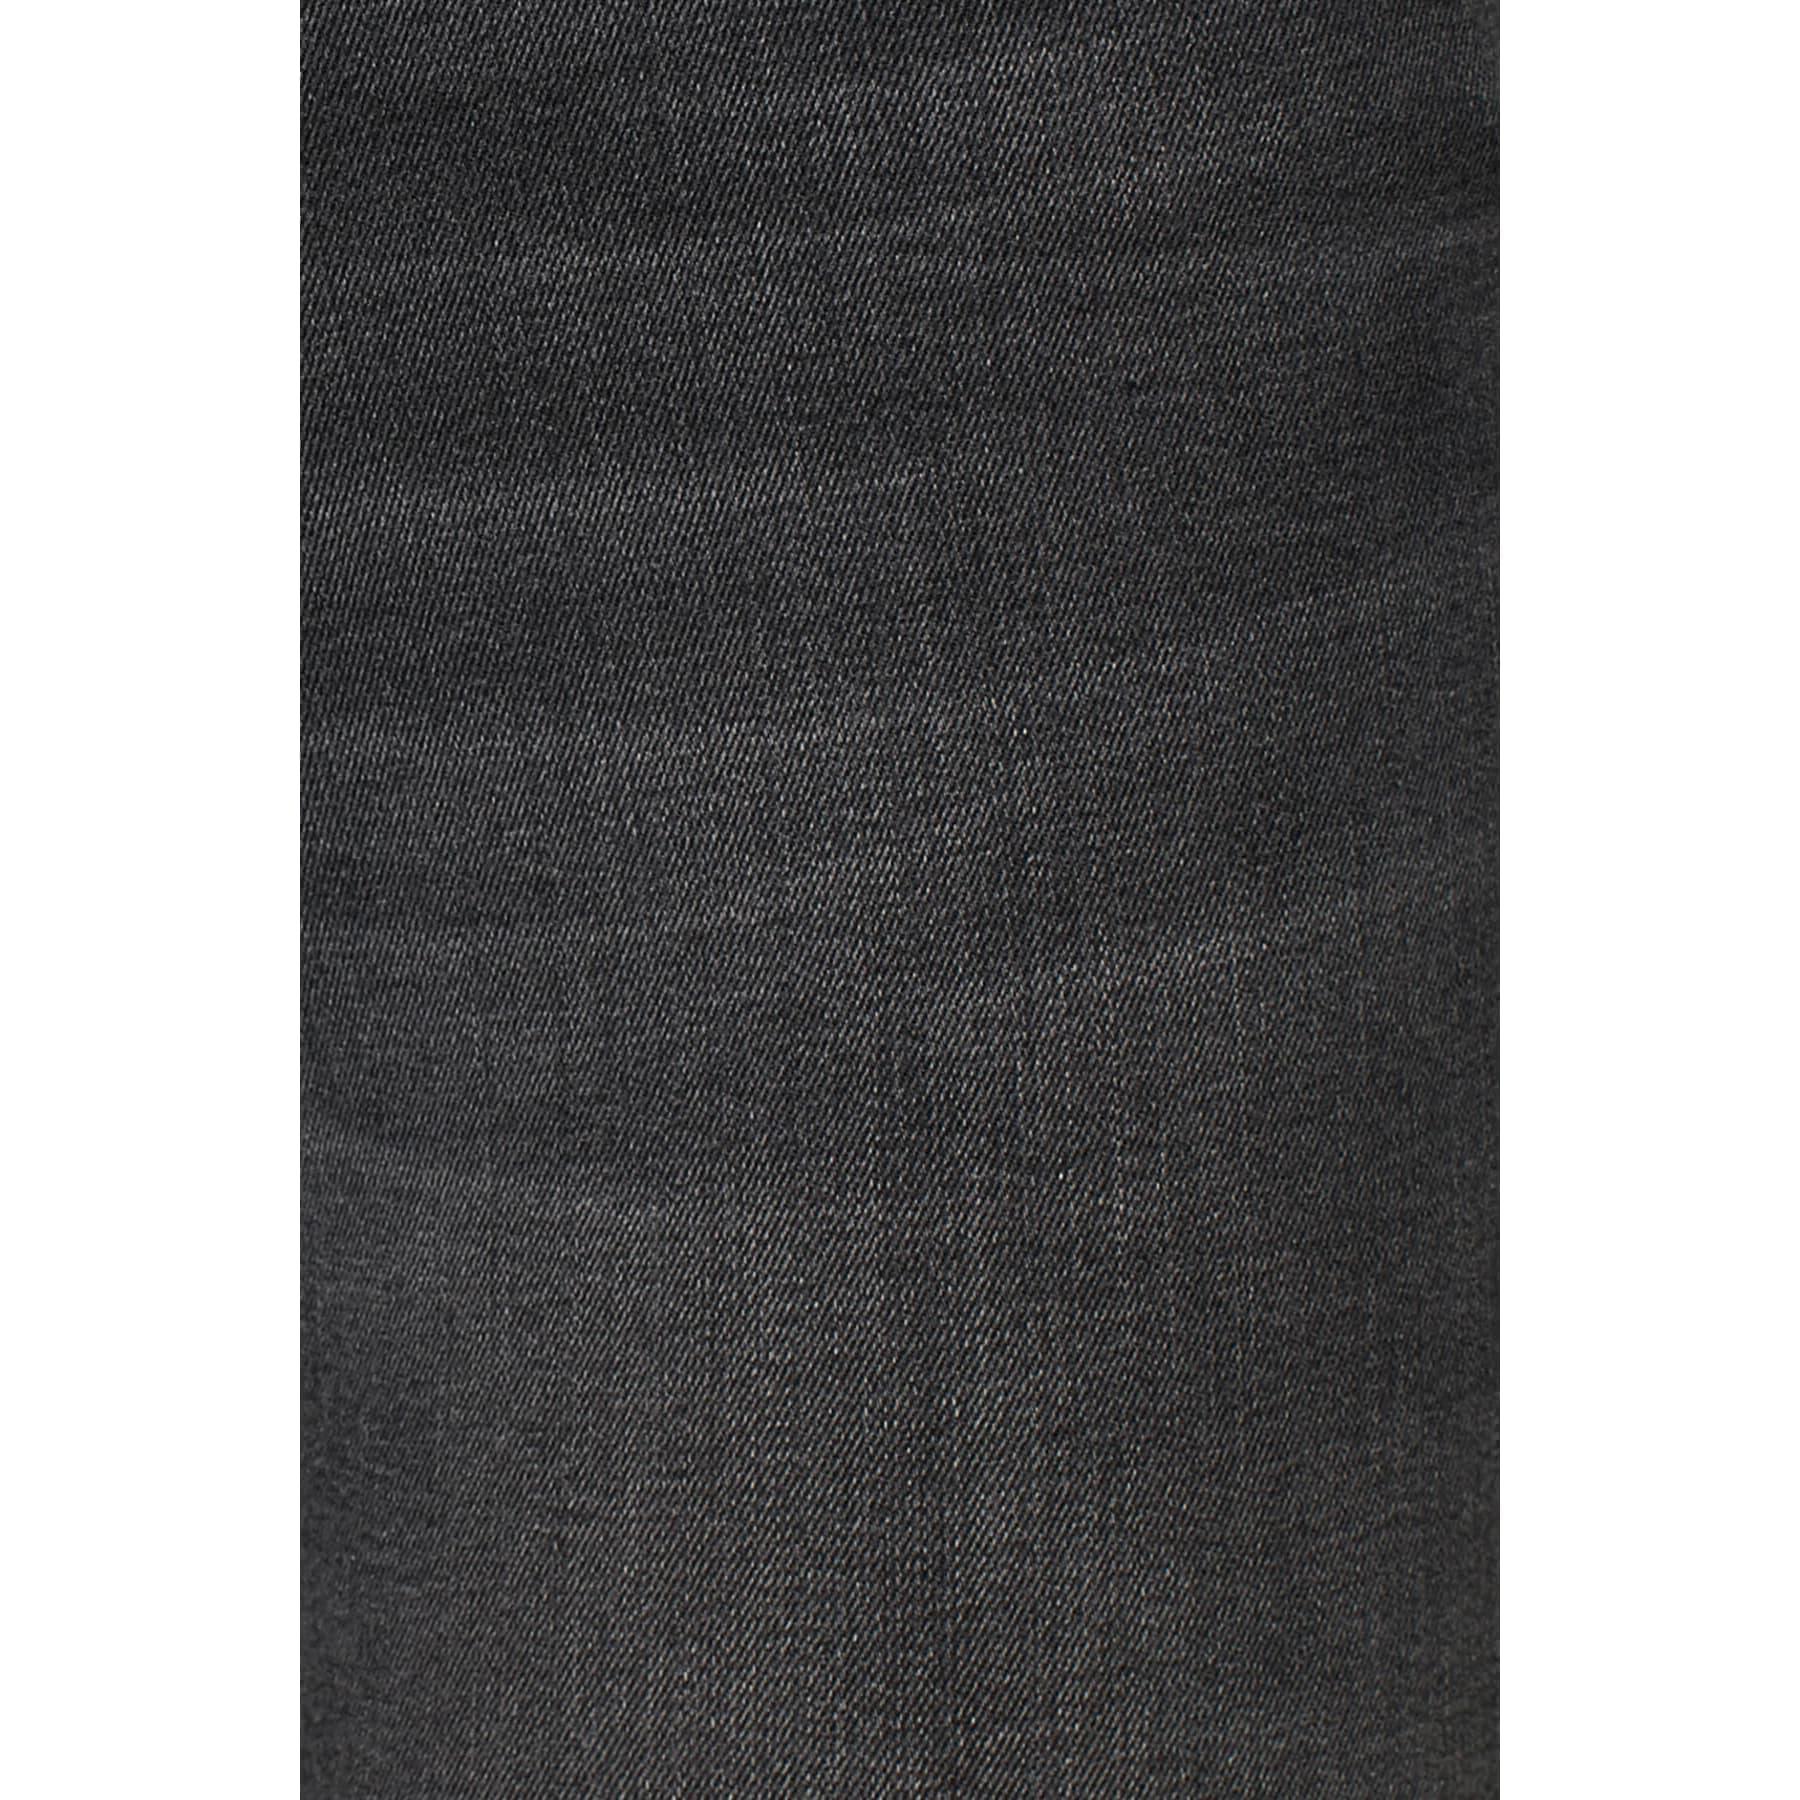 Alissa Gold Kadın Siyah Kot Pantolon